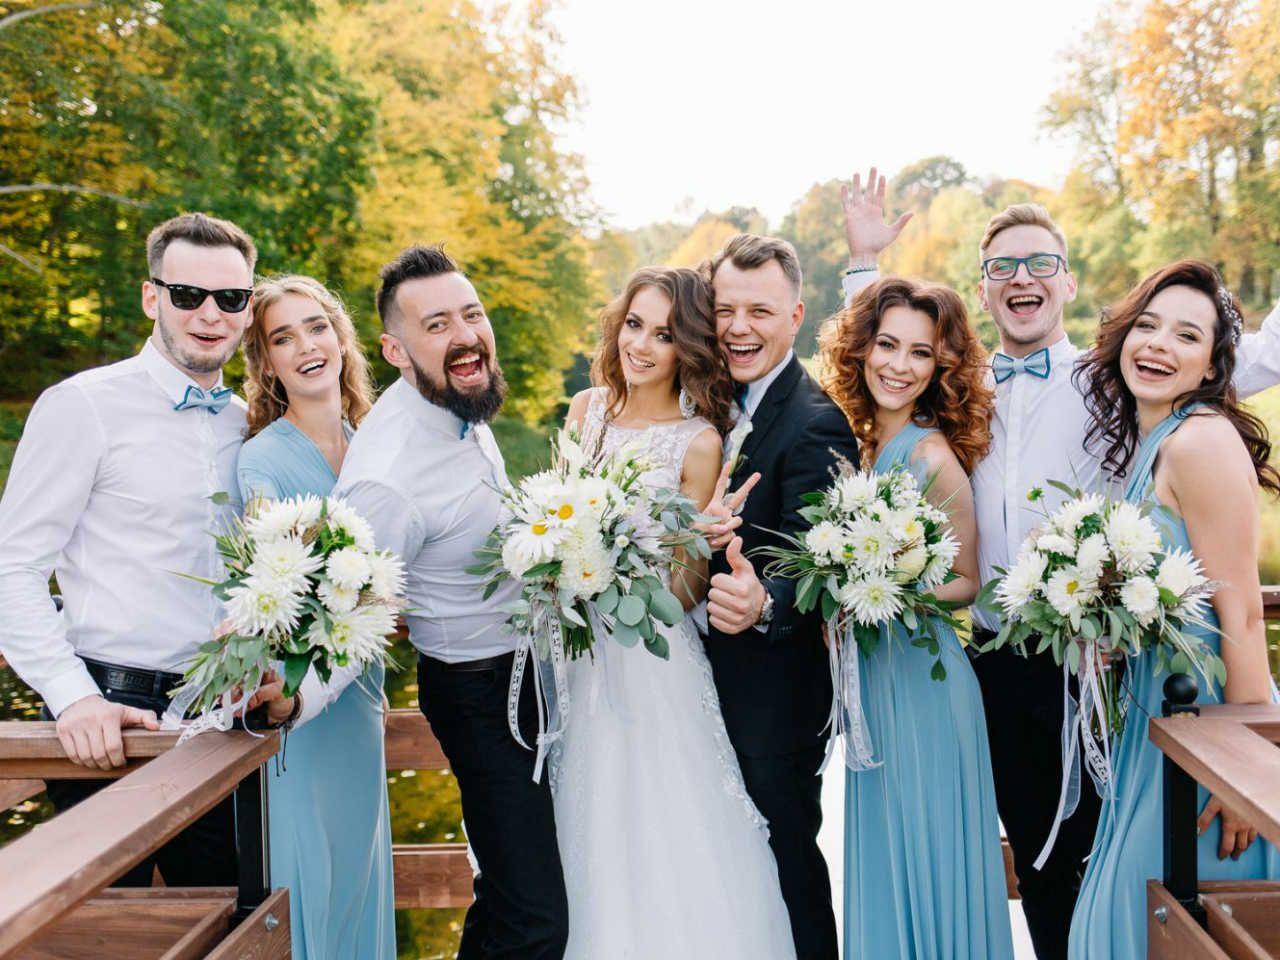 31c585ee4b Modne sukienki na wesele 2019. Piękne i elegancke - Kraina Stylu